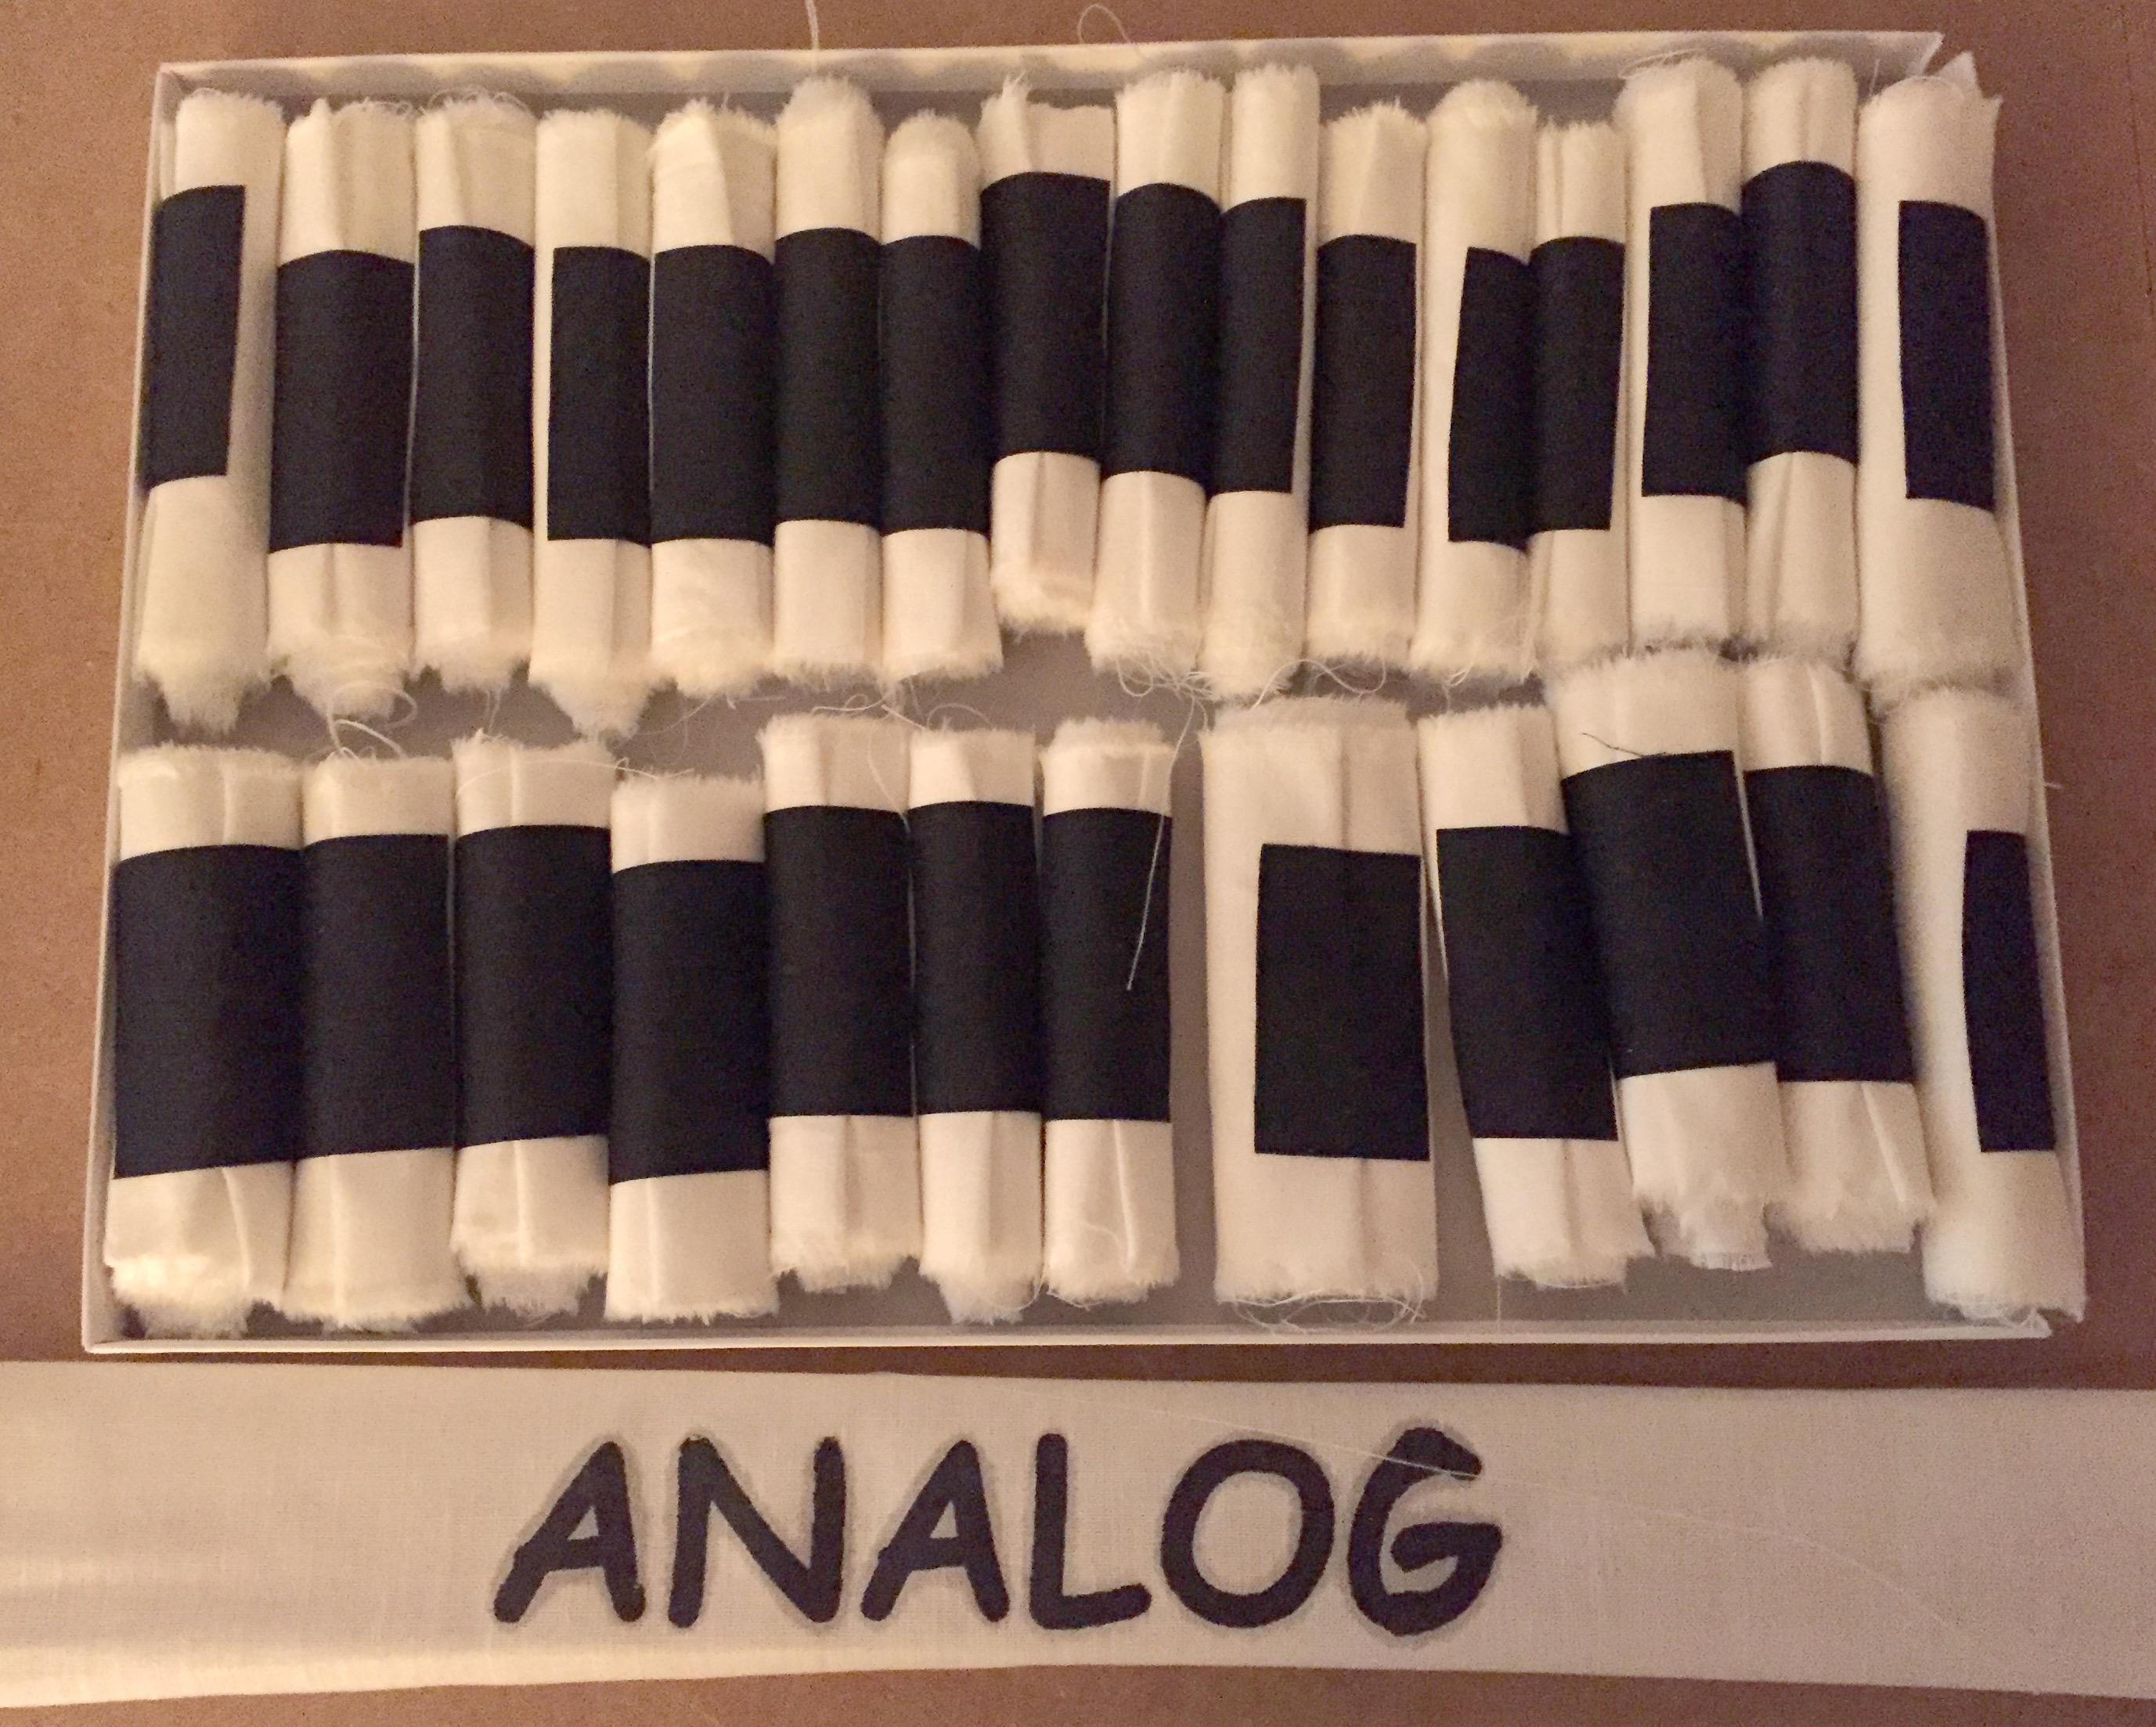 Analog-bånd (1)